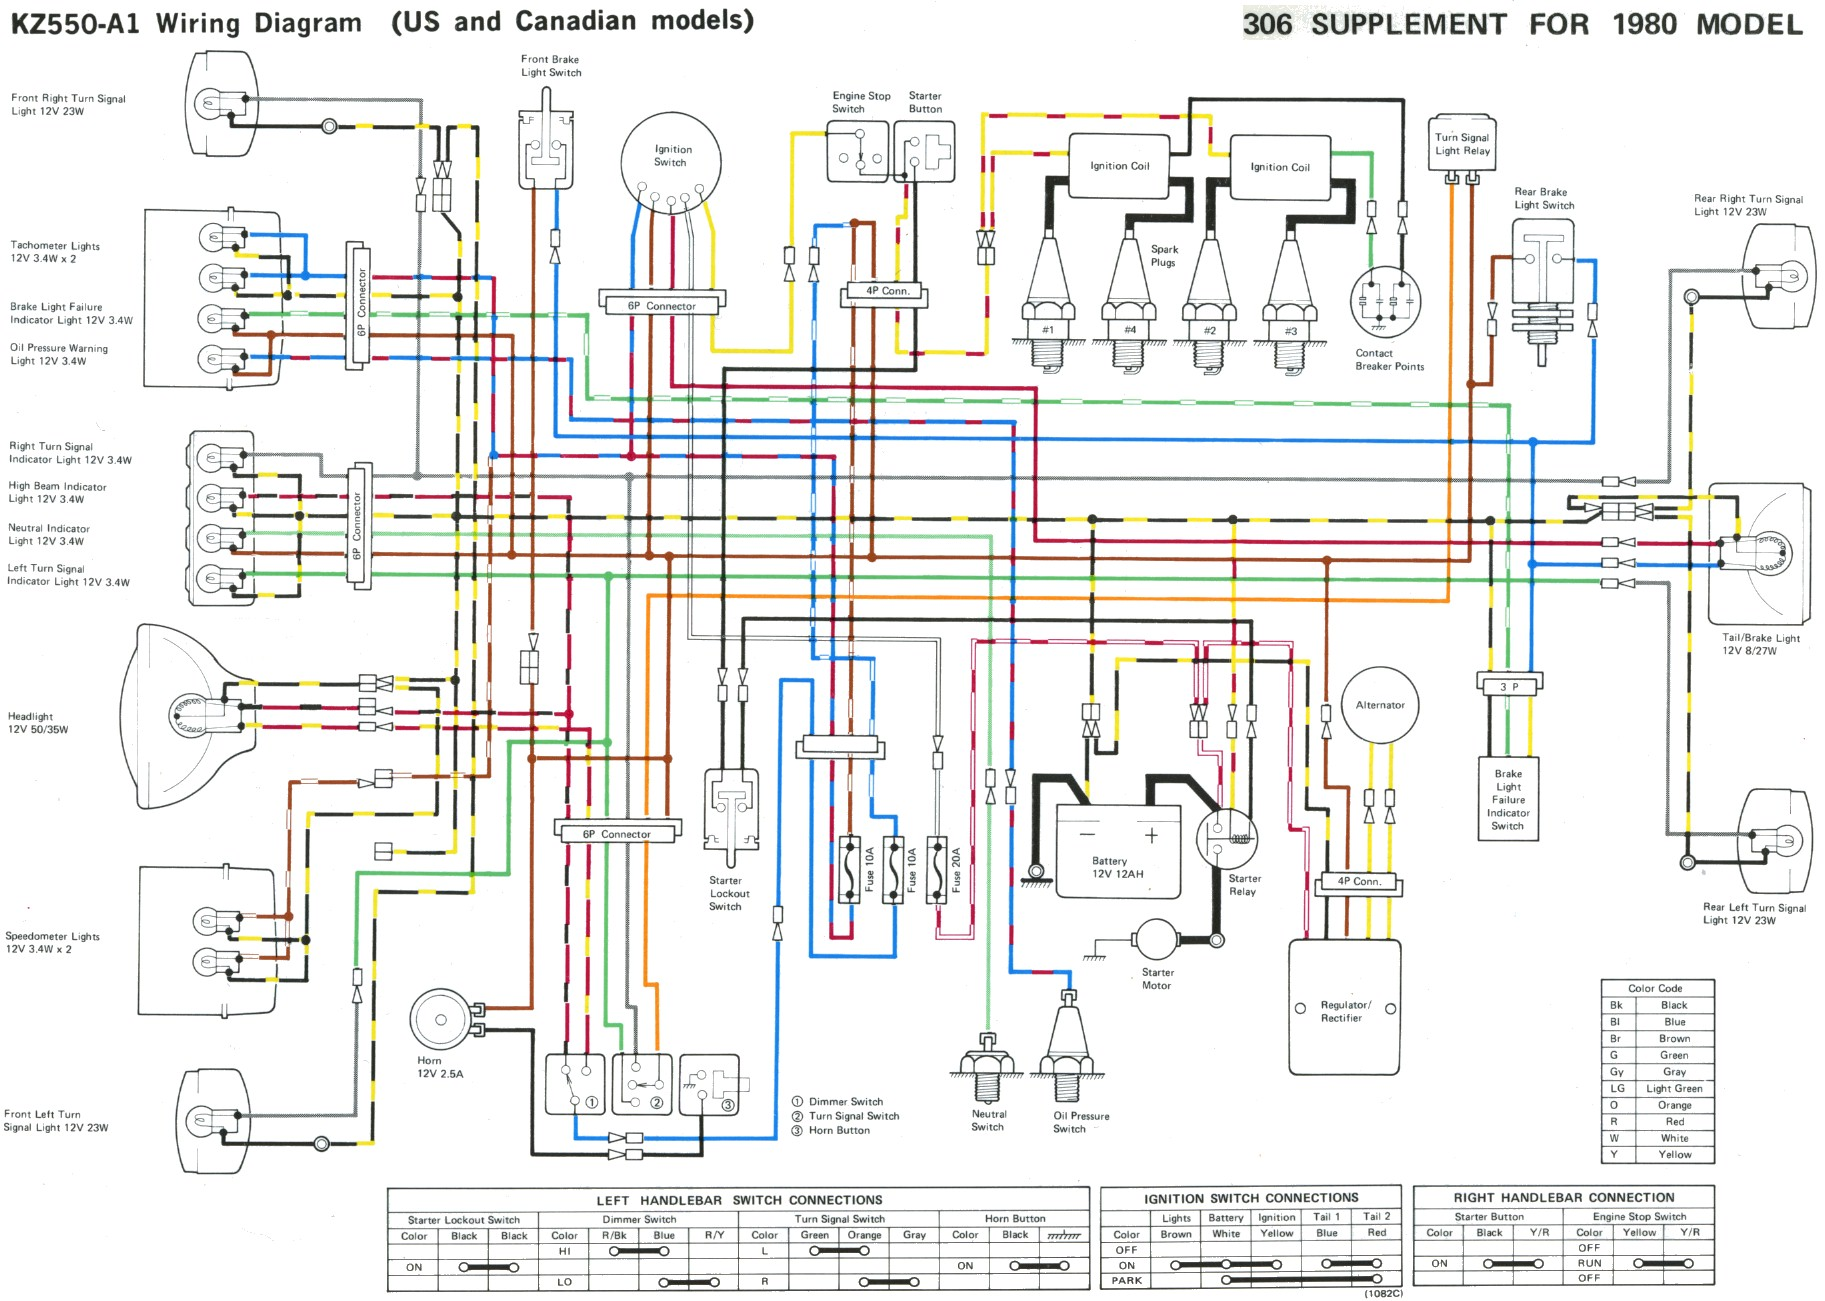 Ktm 550 Wiring Diagram Free Picture Wiring Diagram Schematic ... Ktm Wiring Diagram Free Picture Schematic on